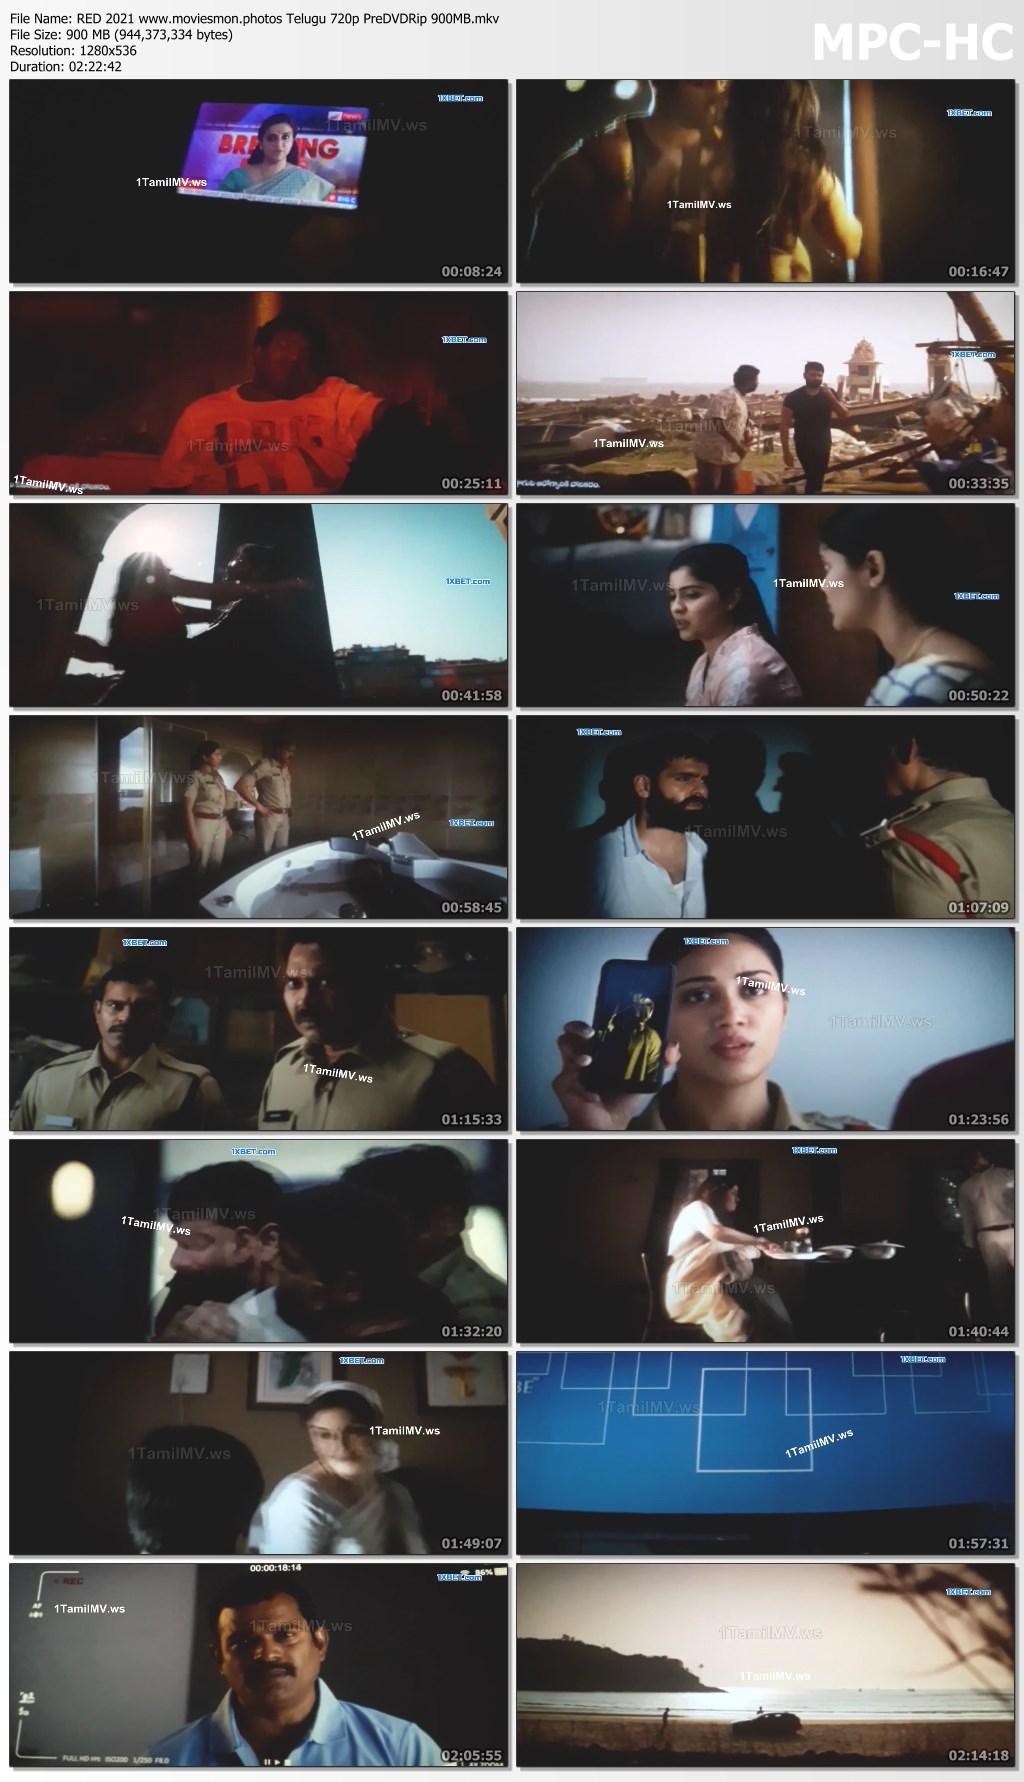 RED 2021 Telugu Full Movie 720p PreDVDRip 900MB Download